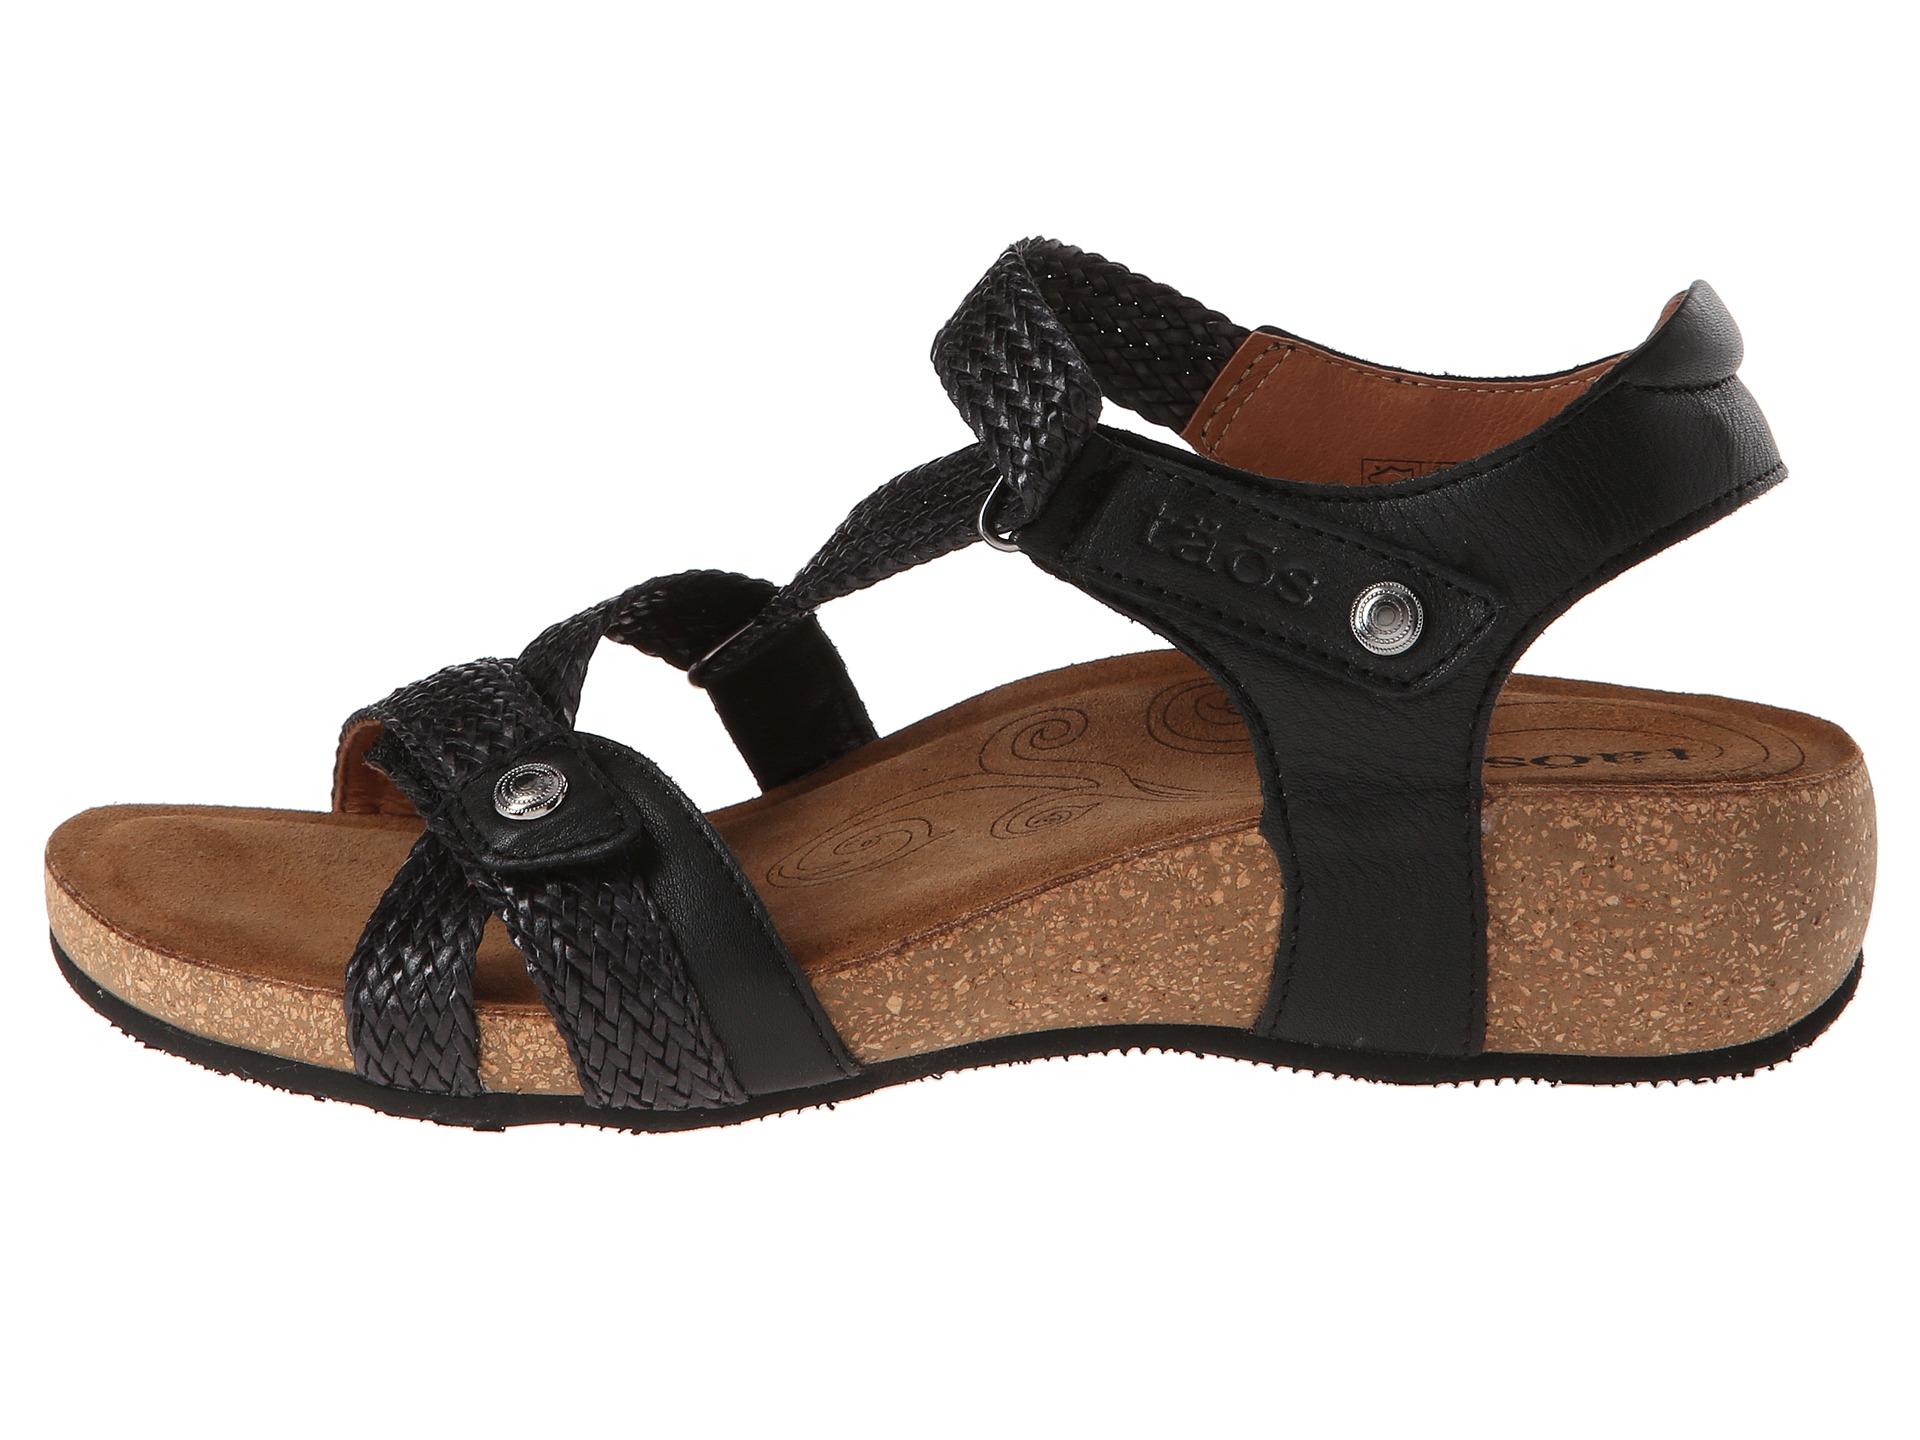 Taos Shoes Size